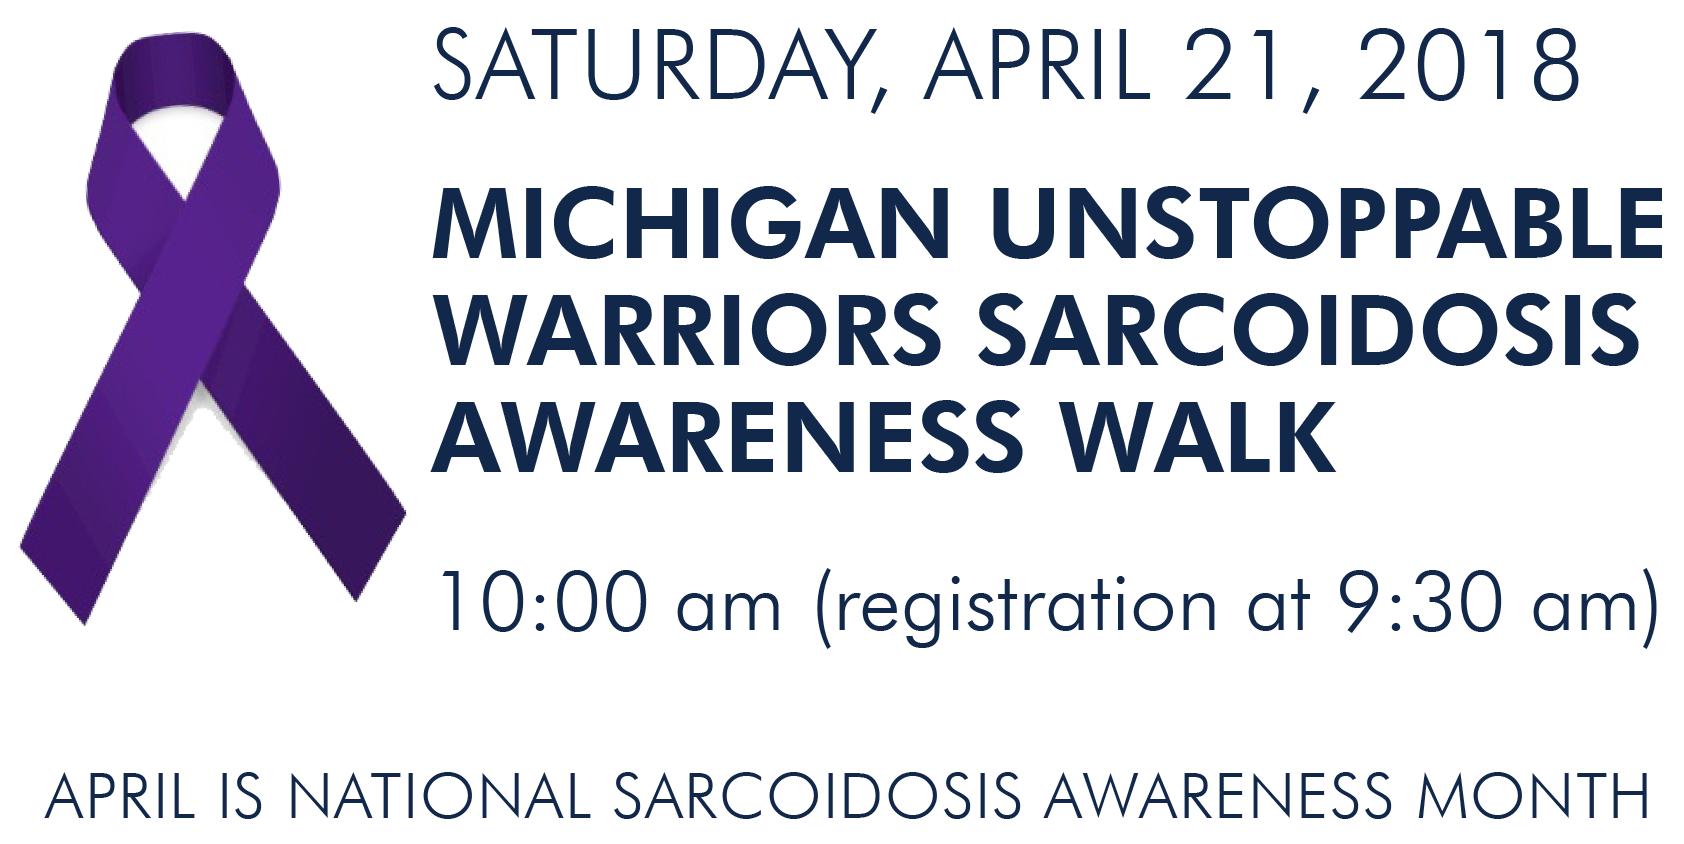 Michigan Unstoppable Warriors Sarcoidosis Awareness Walk